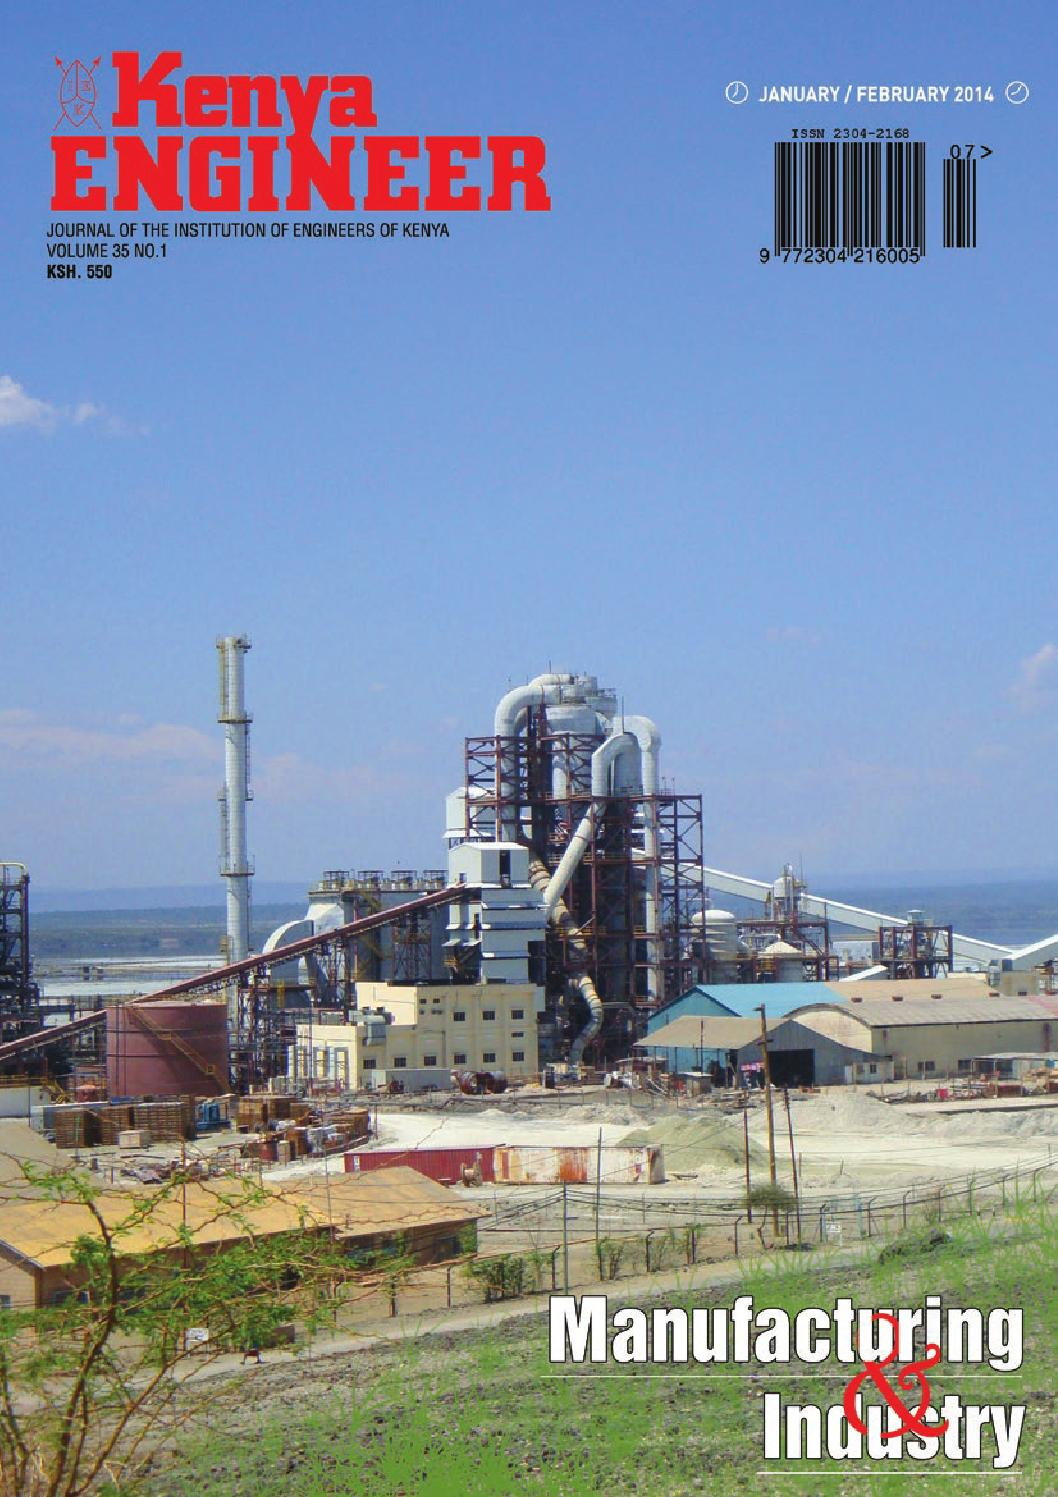 Kenya engineer january february 2014 by kenya Engineer - issuu